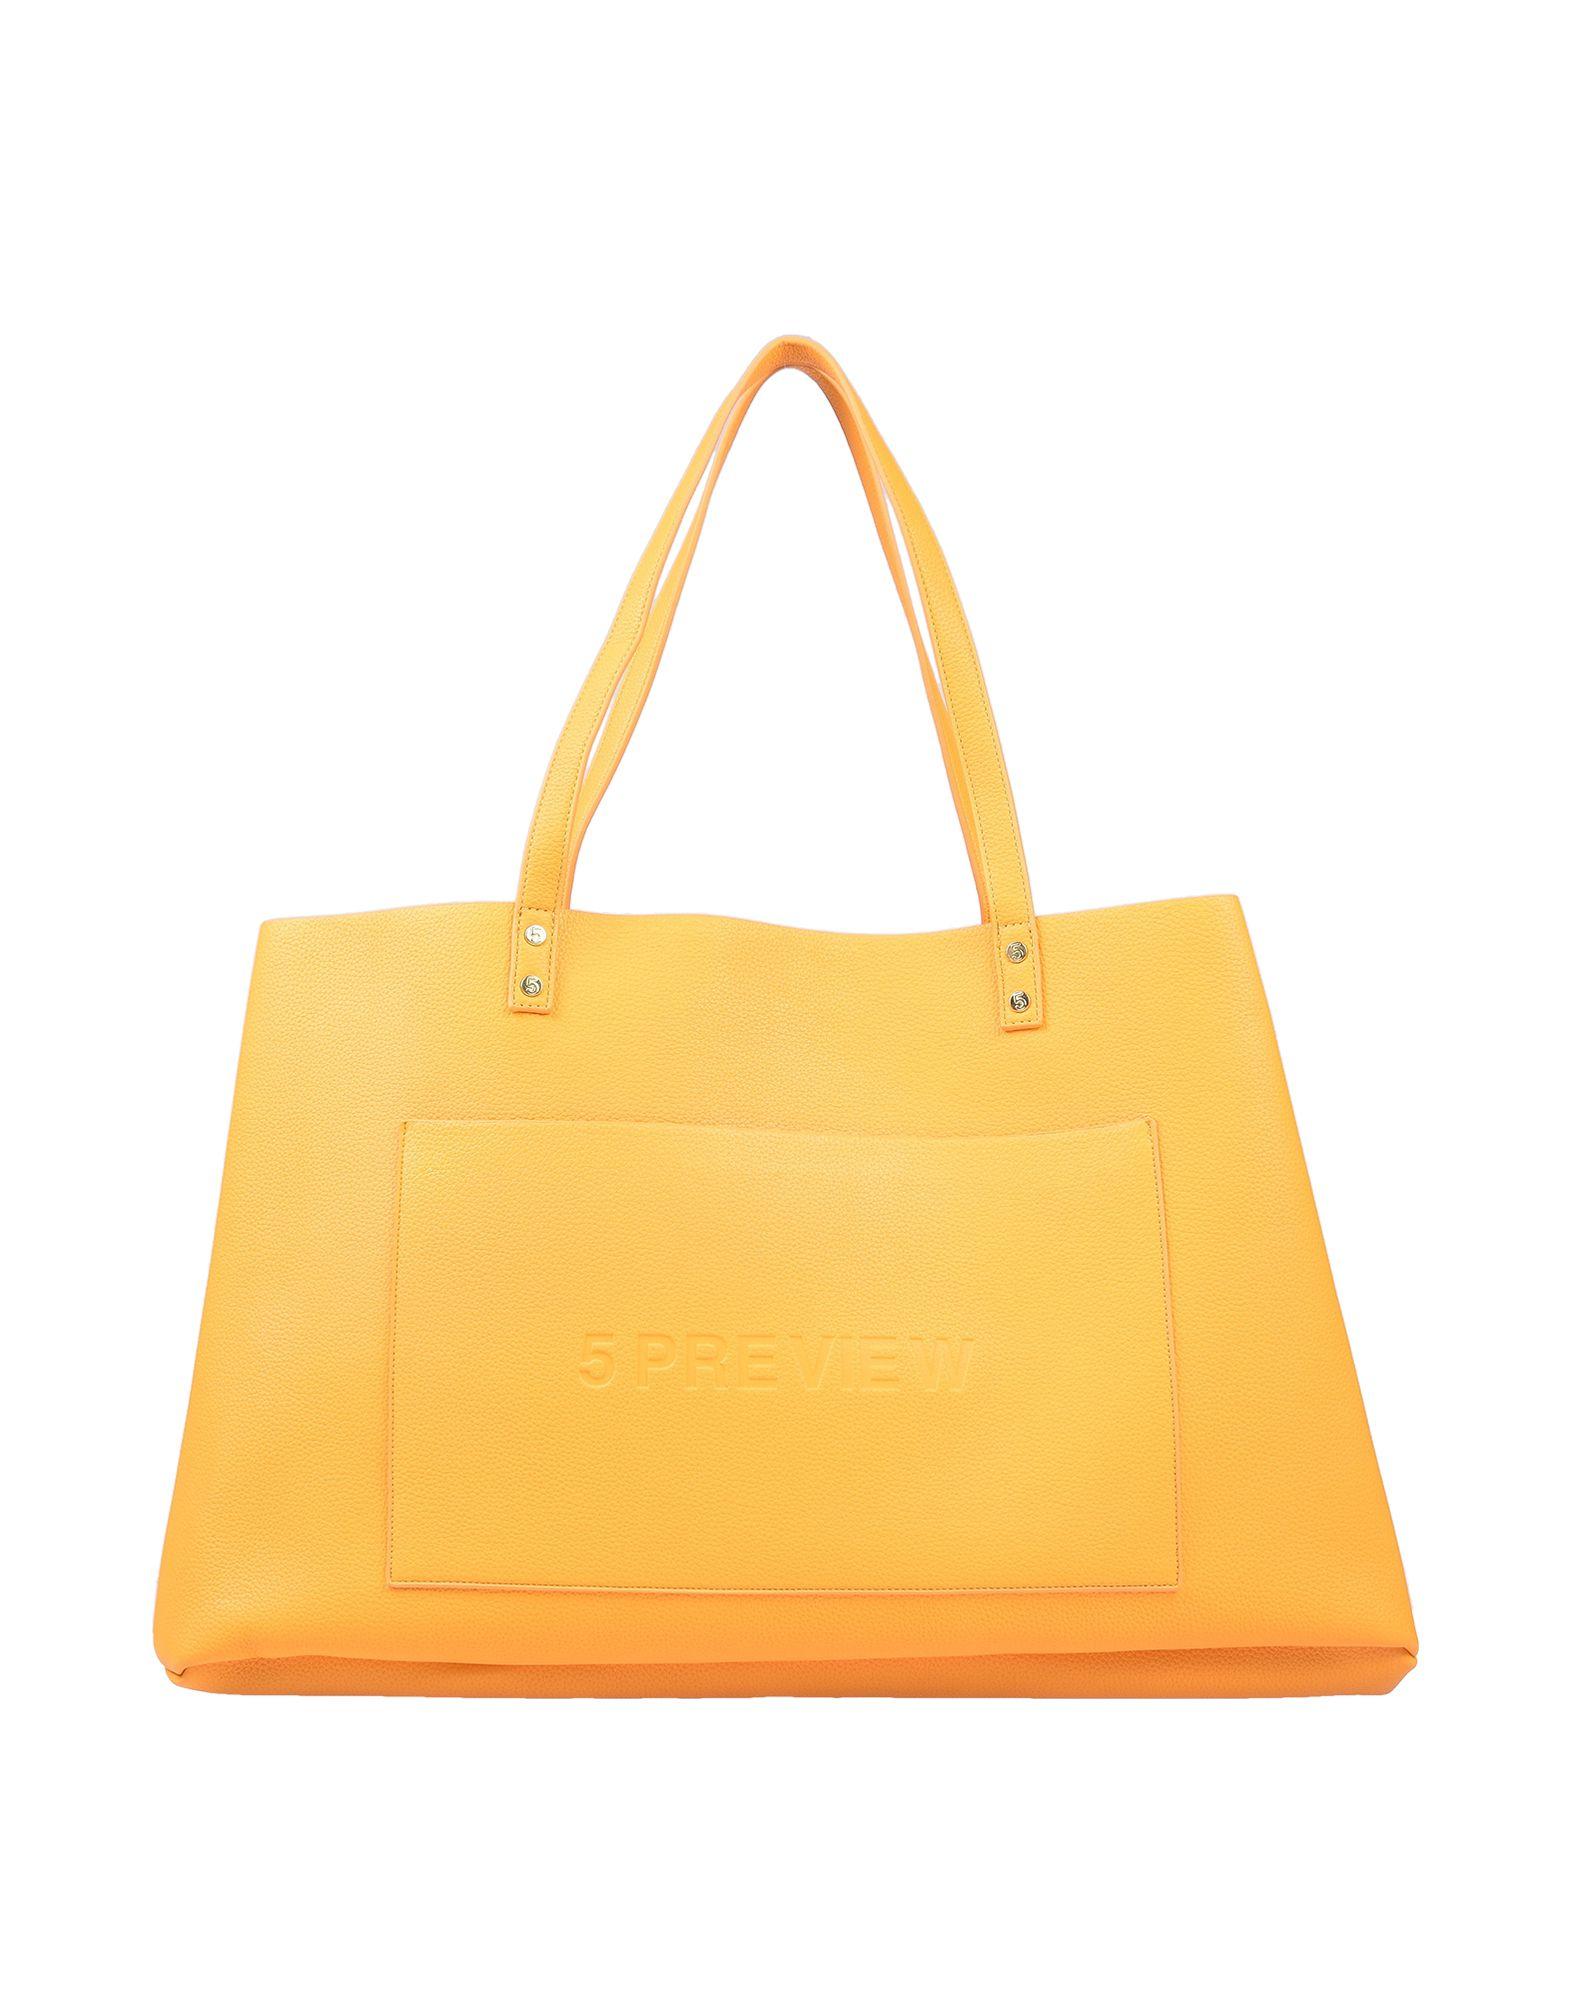 5PREVIEW Shoulder bags - Item 45482220